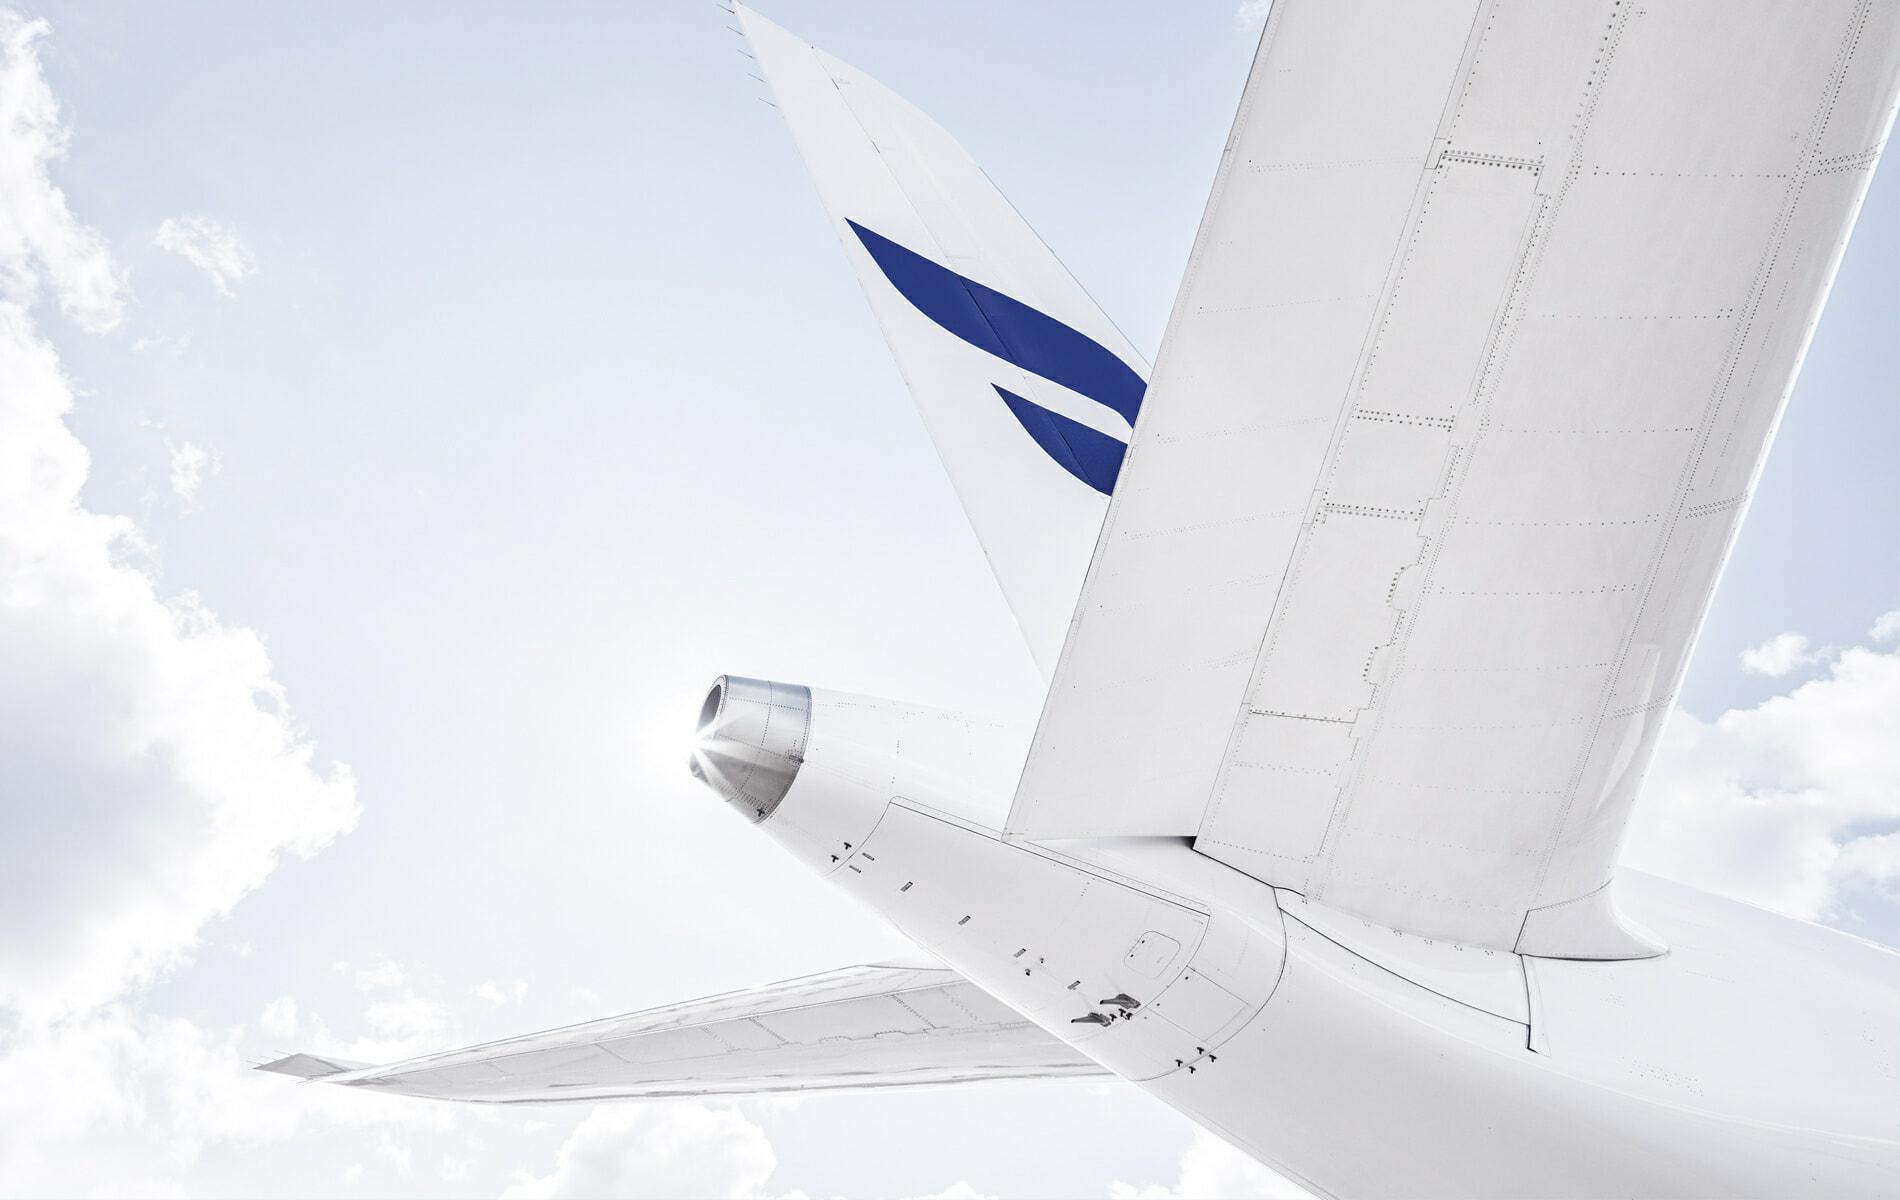 Finnair Airbus A350 detail of tail from below